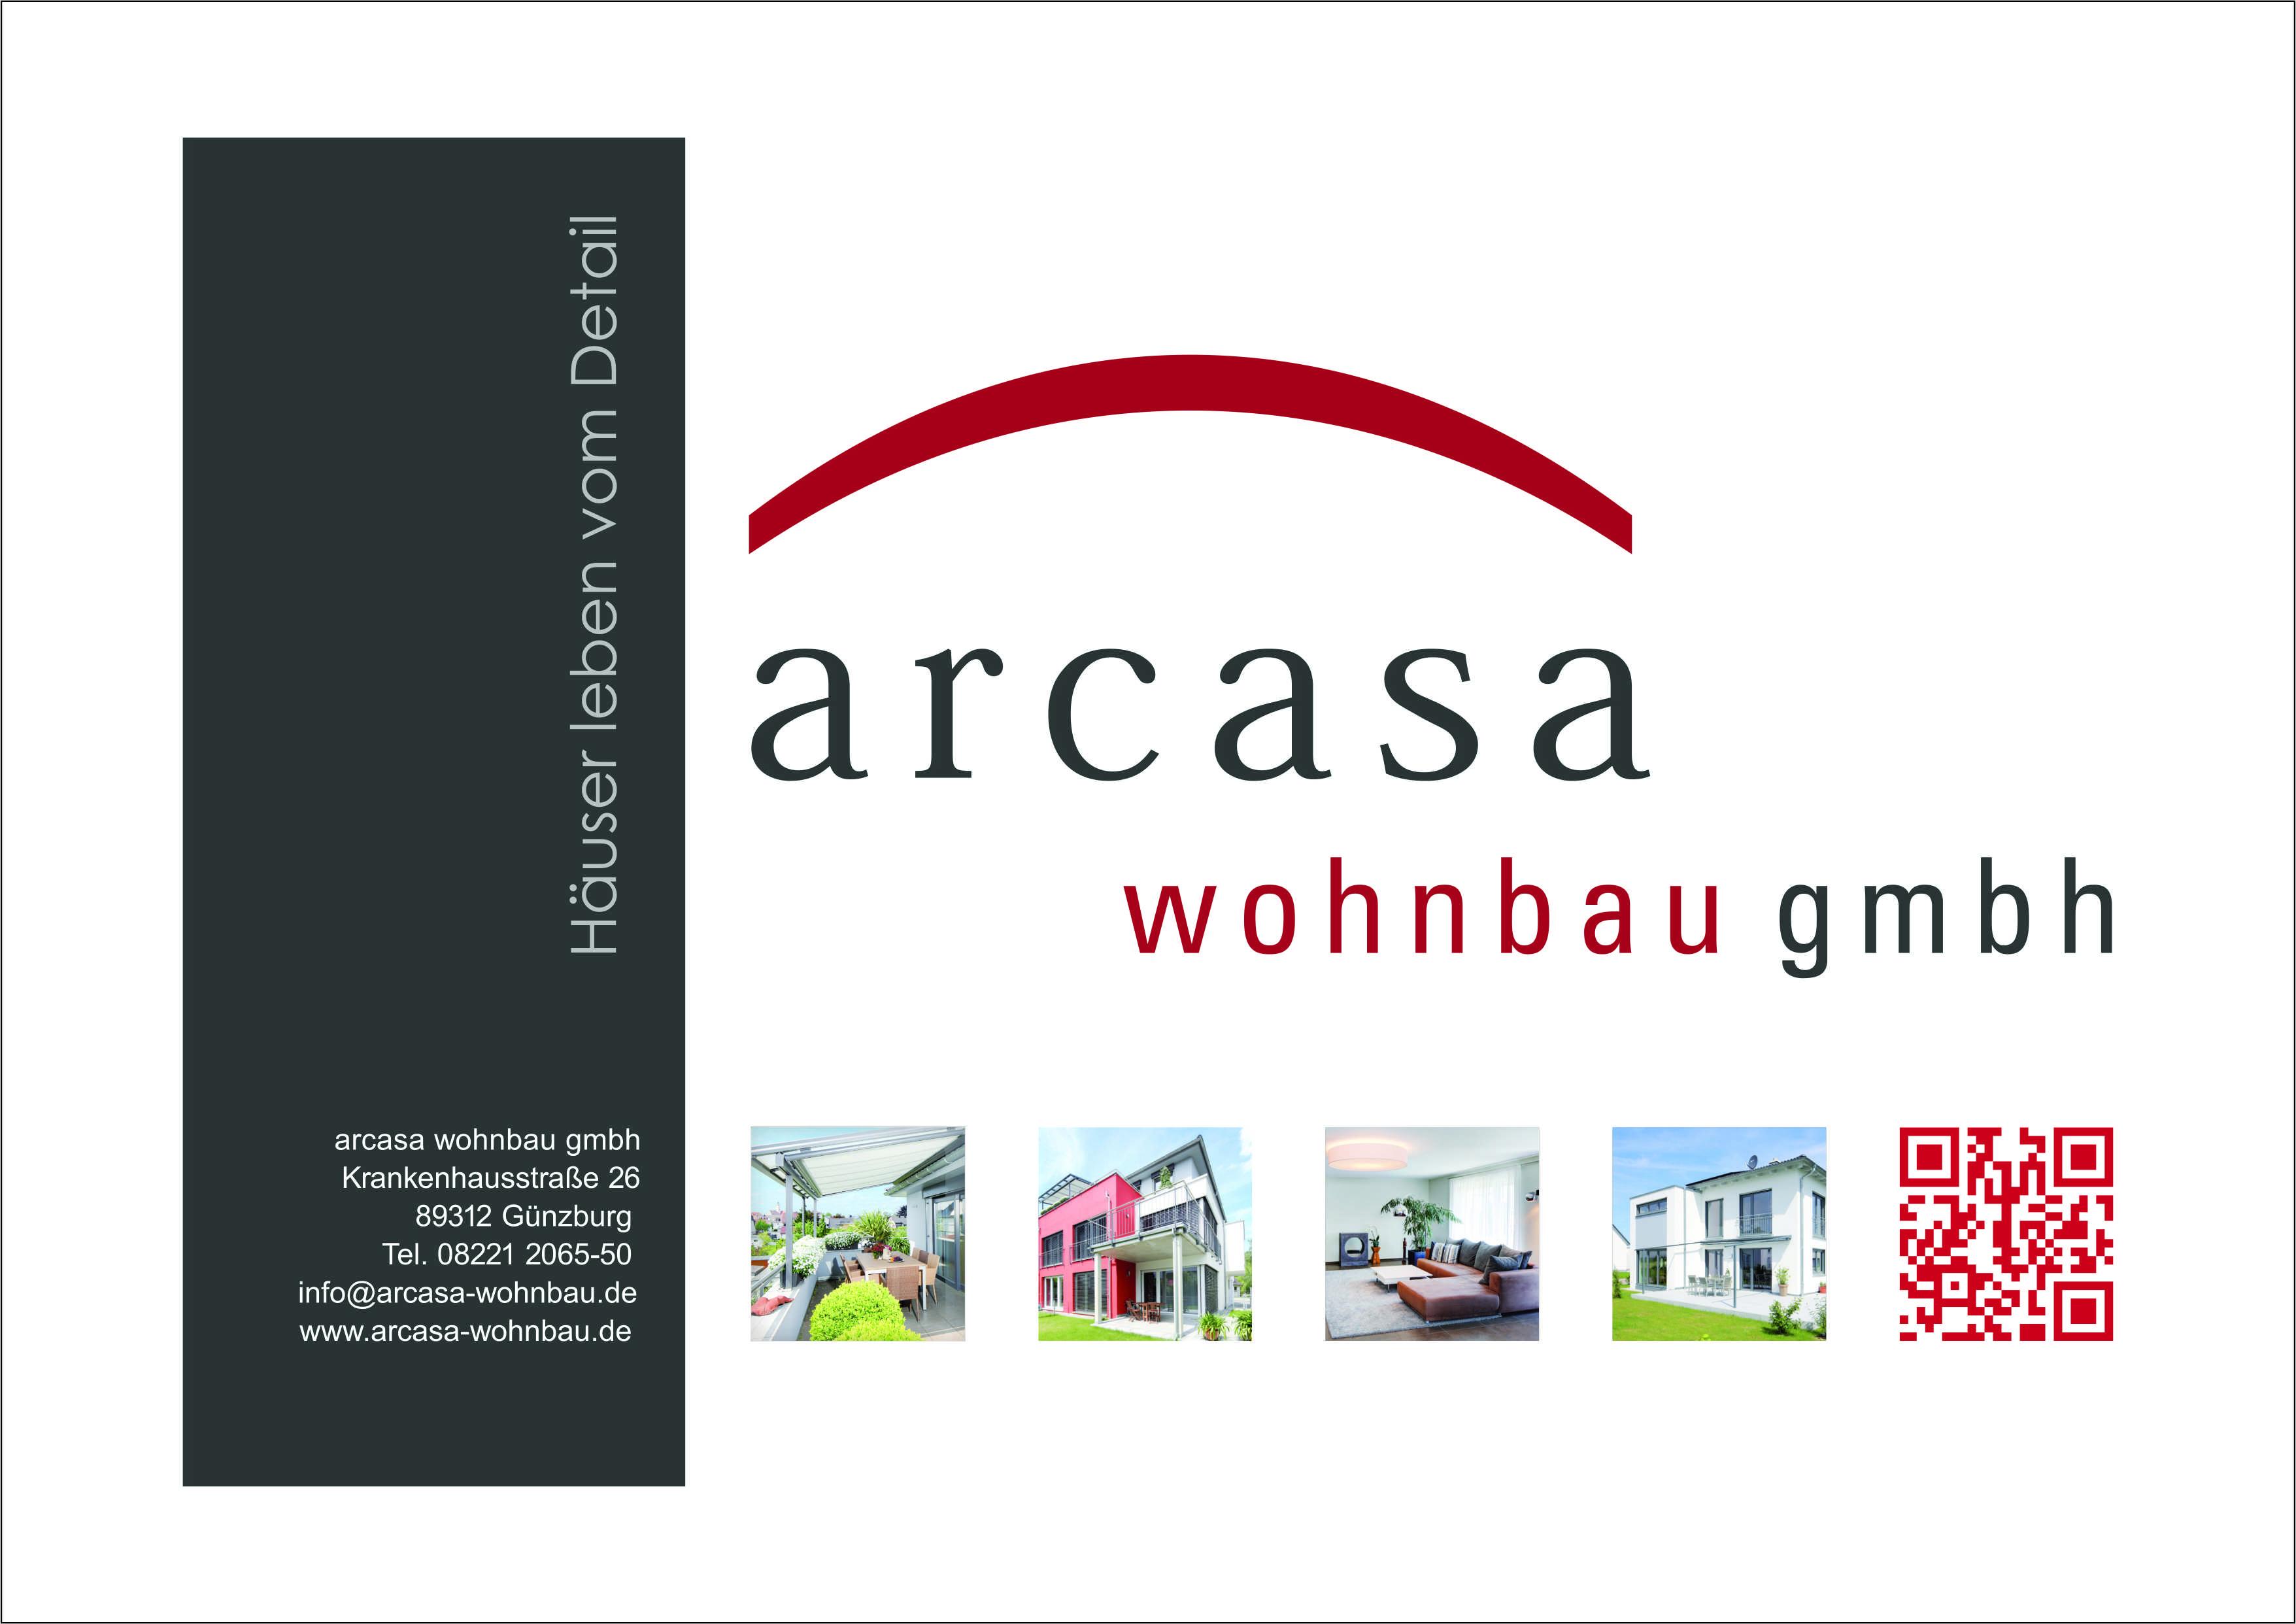 Arcasa Wohnbau GmbH